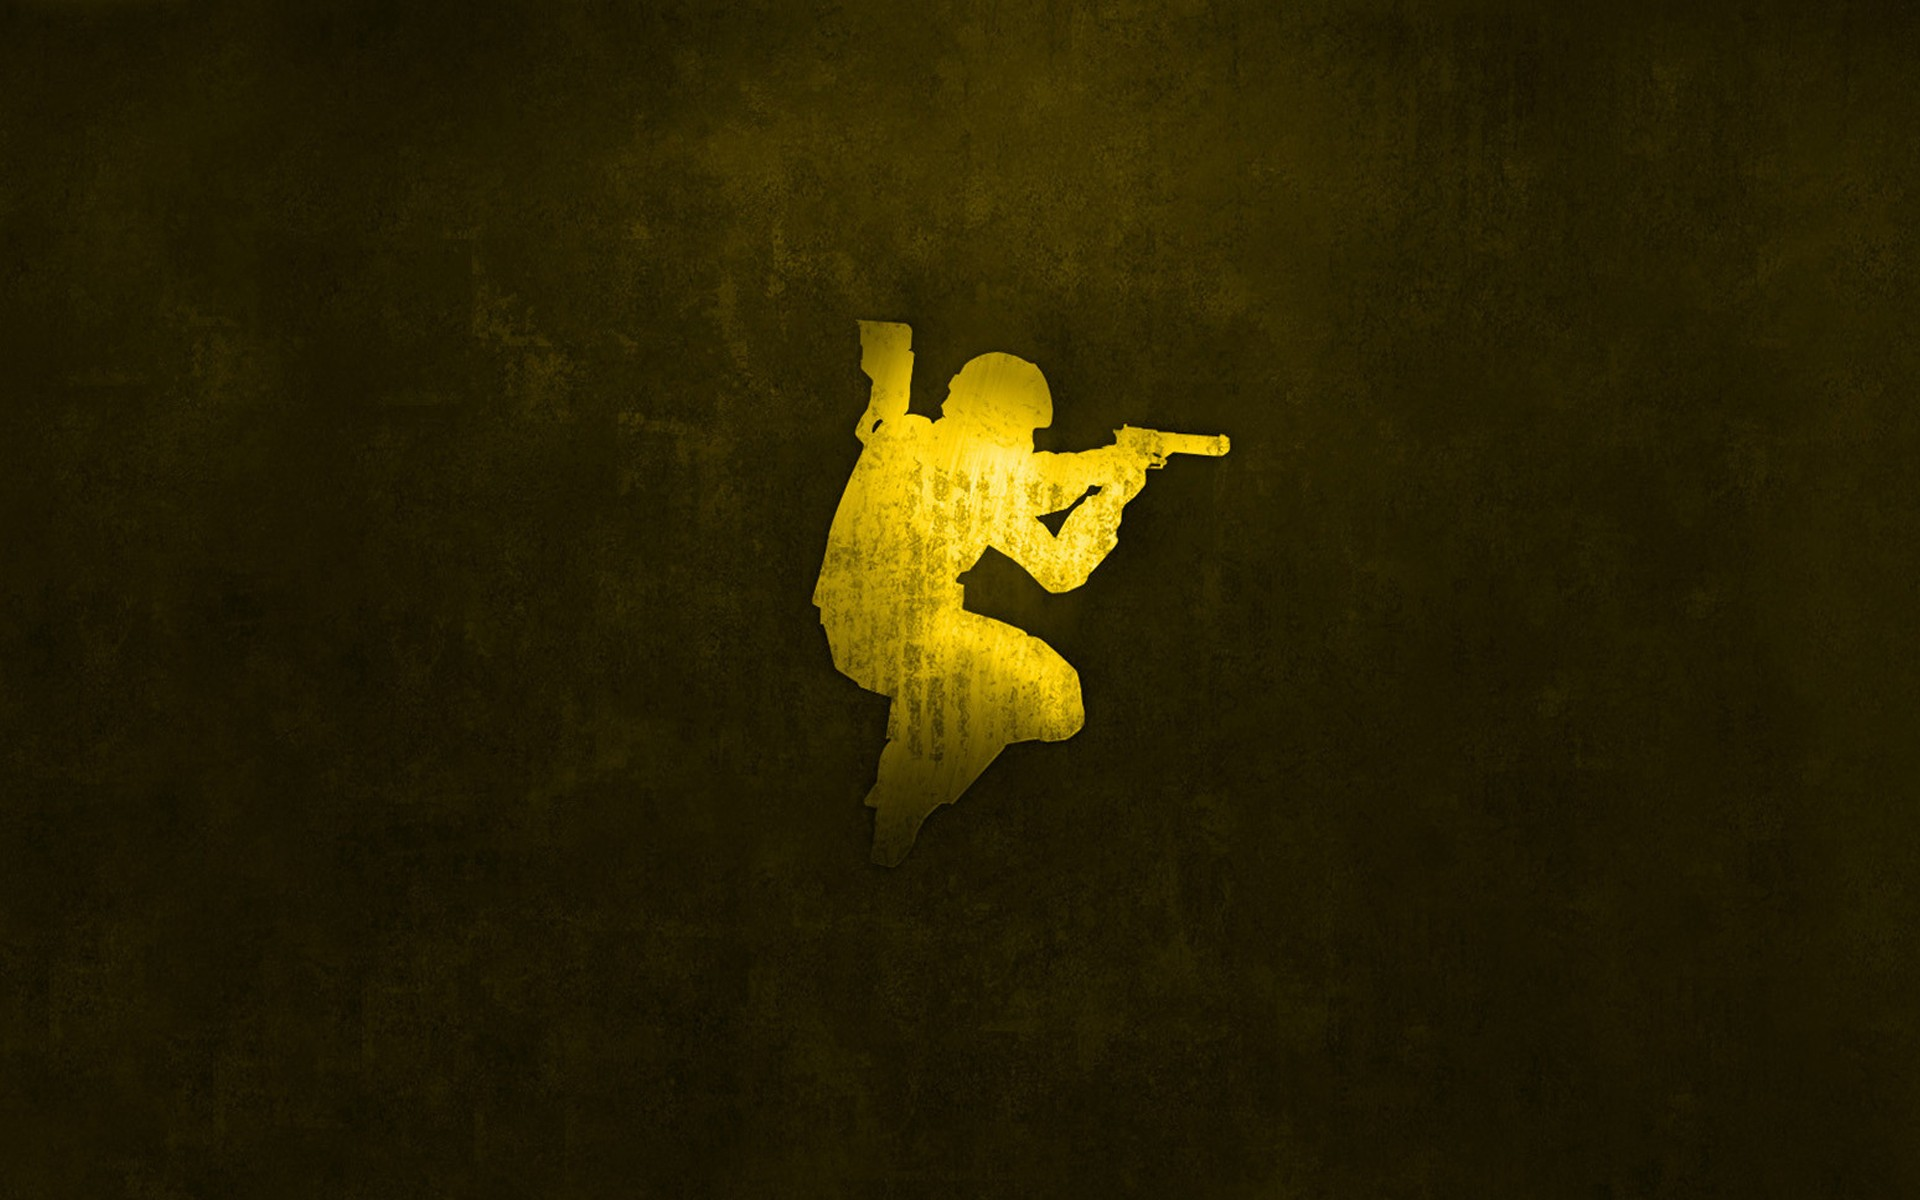 La silueta de un soldado - 1920x1200